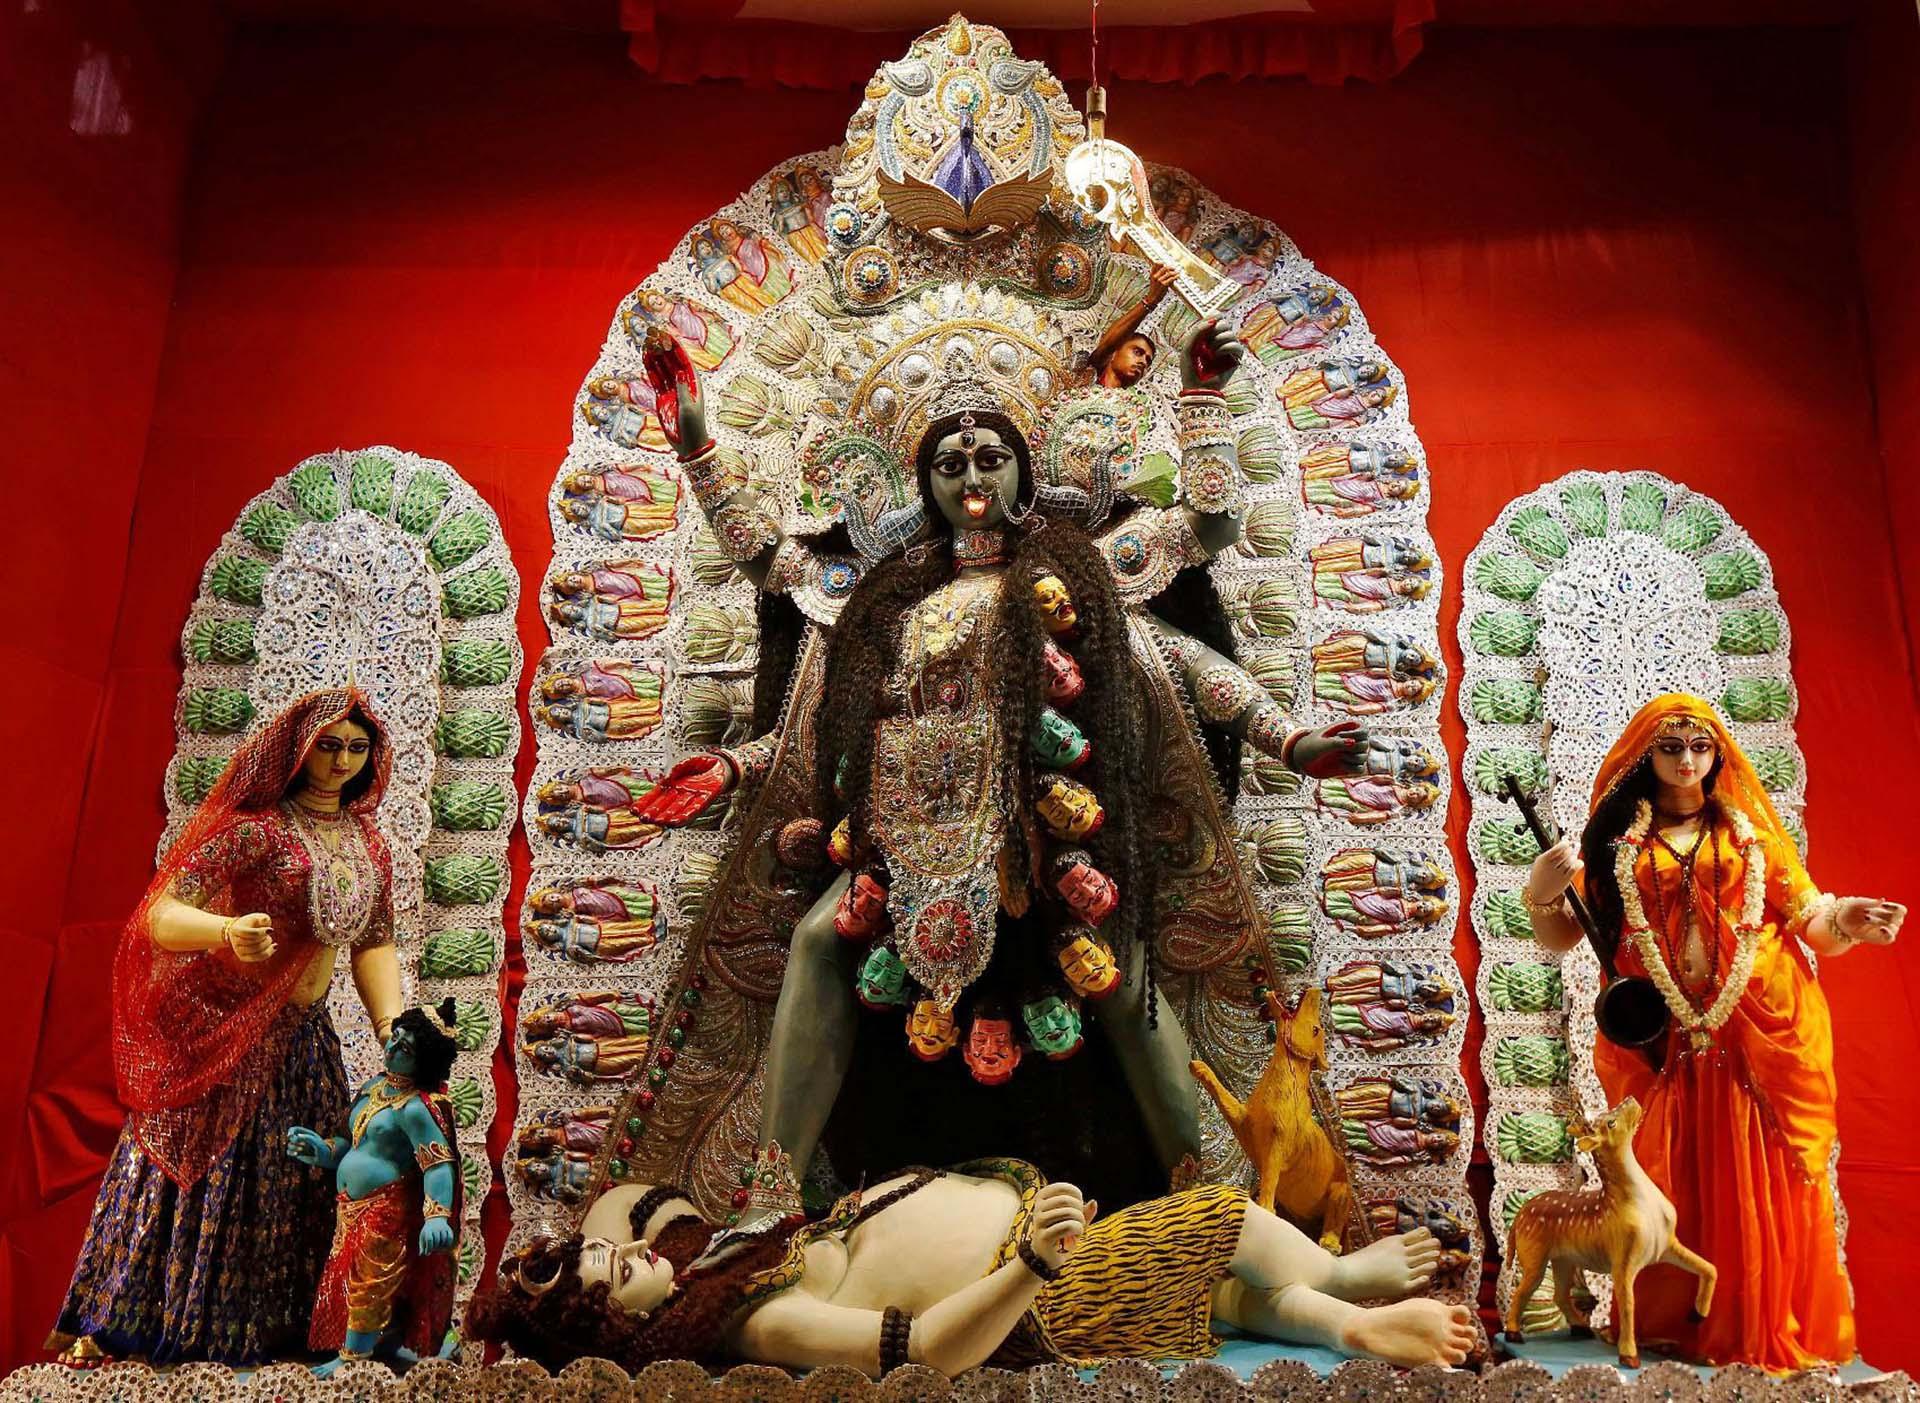 Un artesano finalizando una figura de la diosa hindú Kali dentro de un pandal, una plataforma temporal, en Kolkata, India